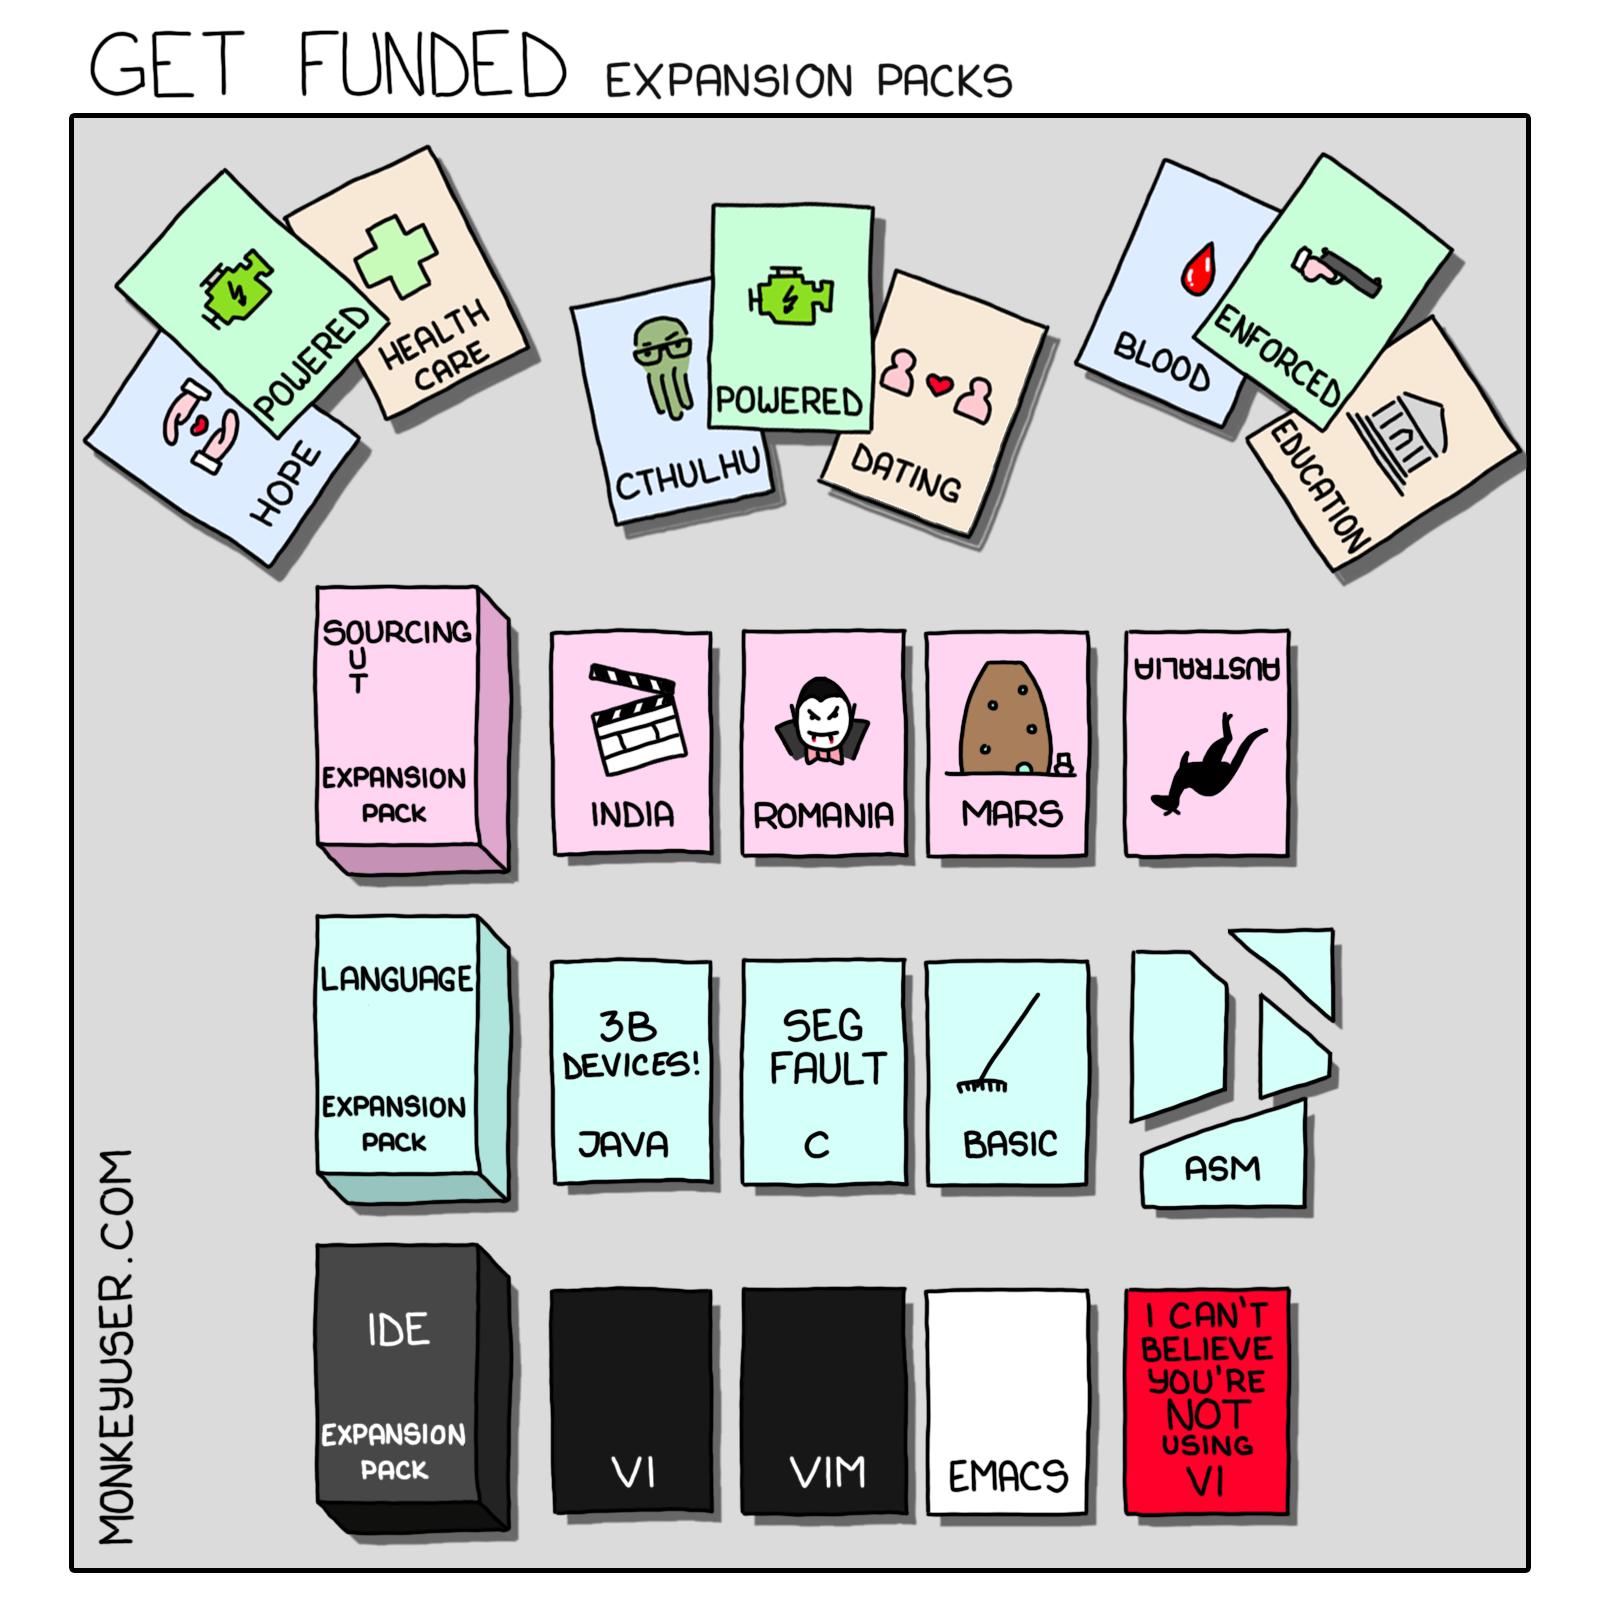 Get Funded: Expansion Packs